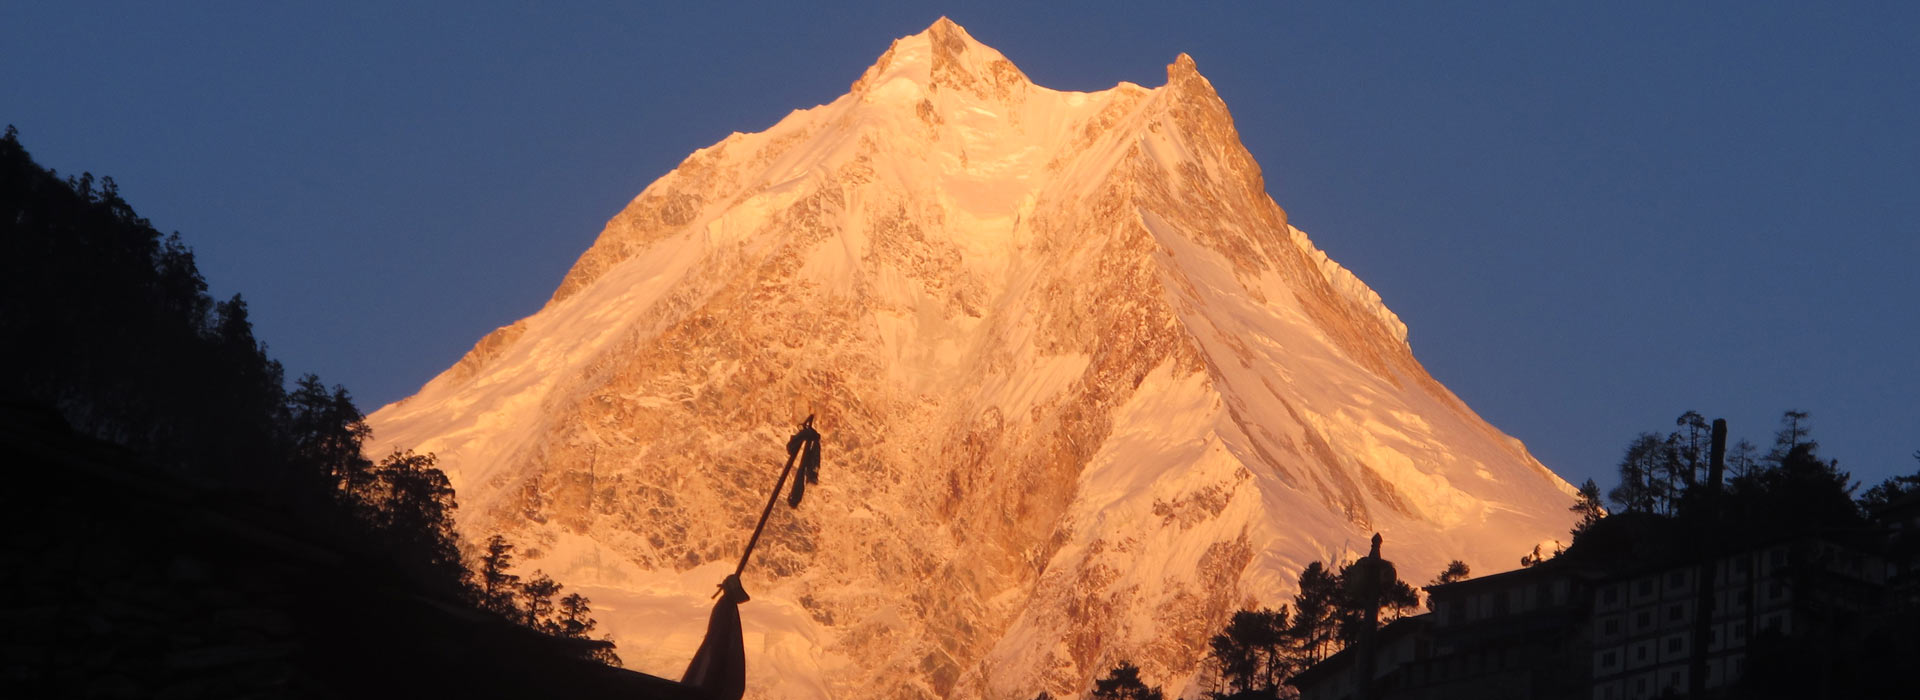 Manaslu Region Treking